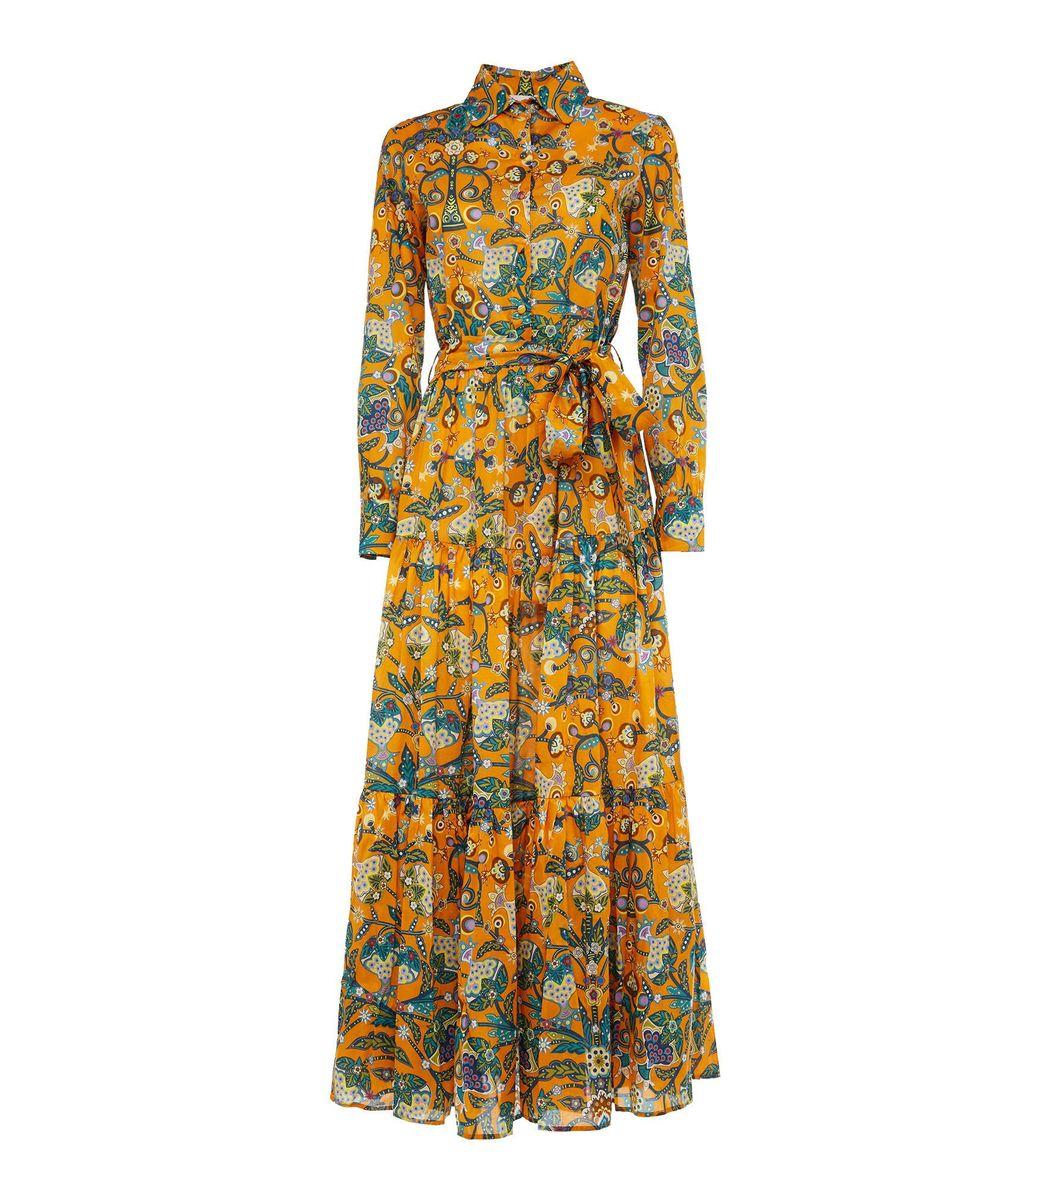 La Doublej Downs Bellini Dress in Tree of Life Arancio